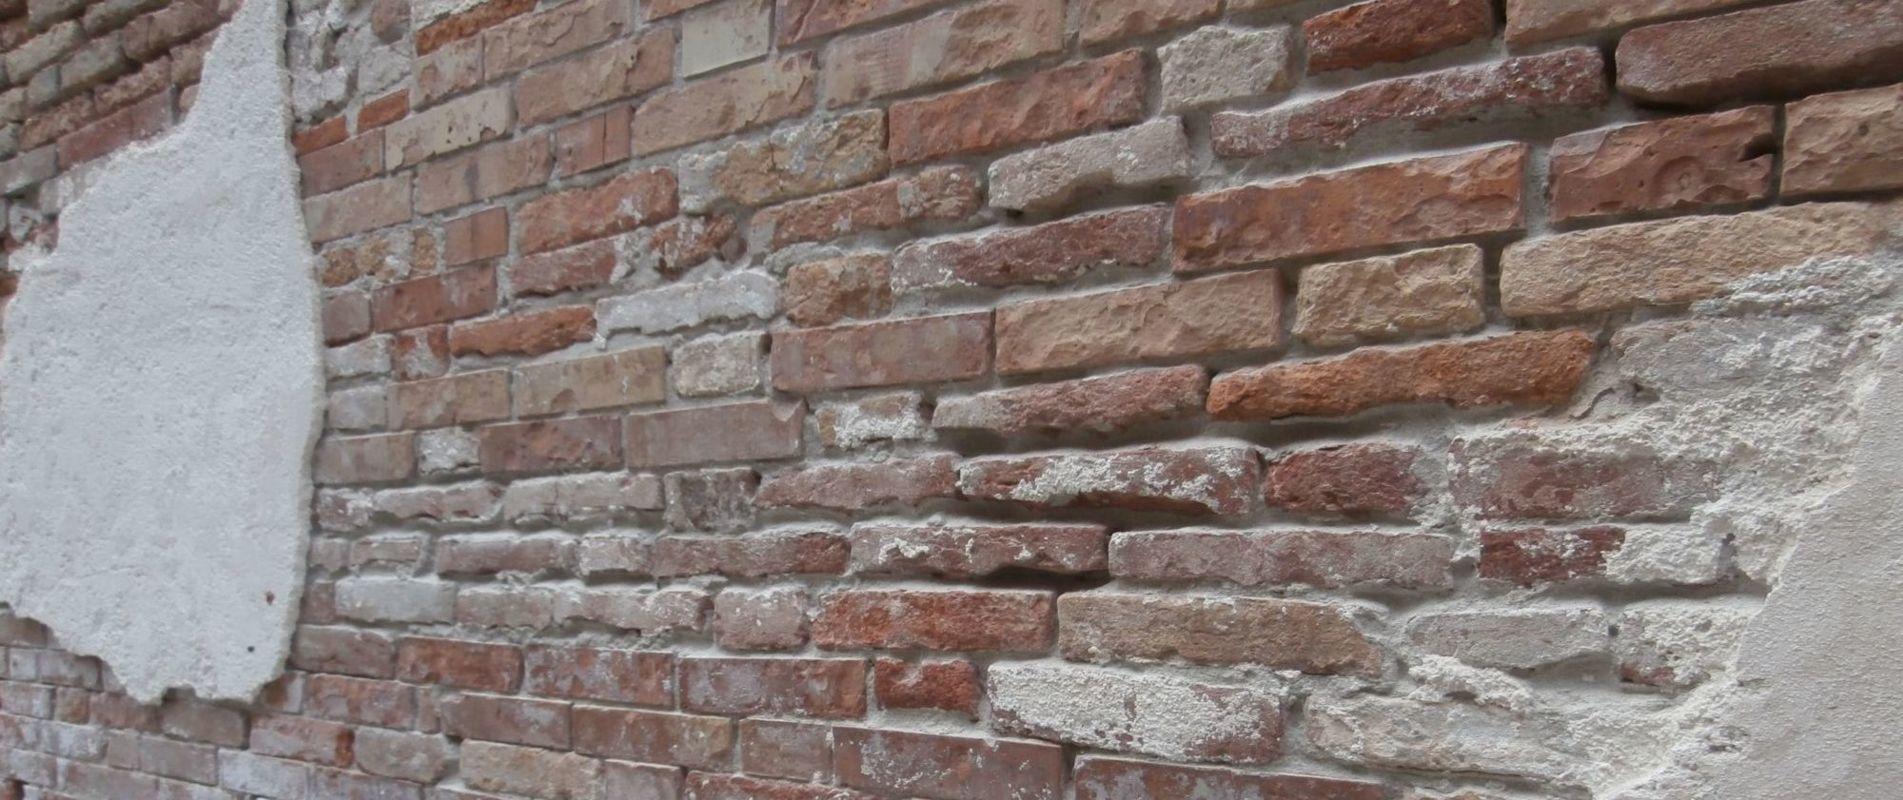 Rayleigh Plastering | Essex Plastering | Plastering